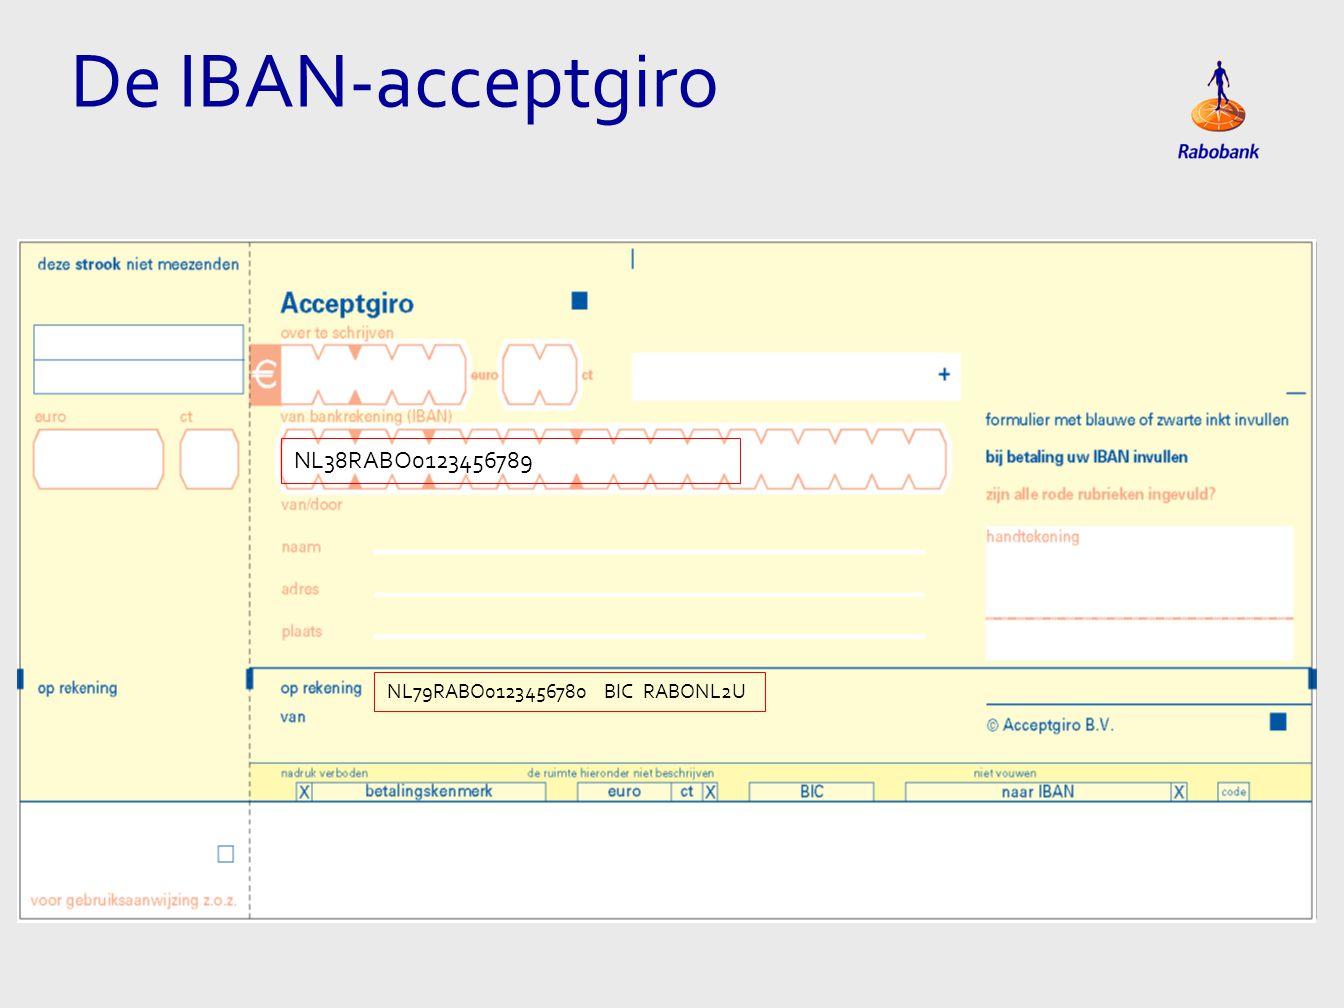 De IBAN-acceptgiro NL38RABO0123456789 NL79RABO0123456780 BIC RABONL2U